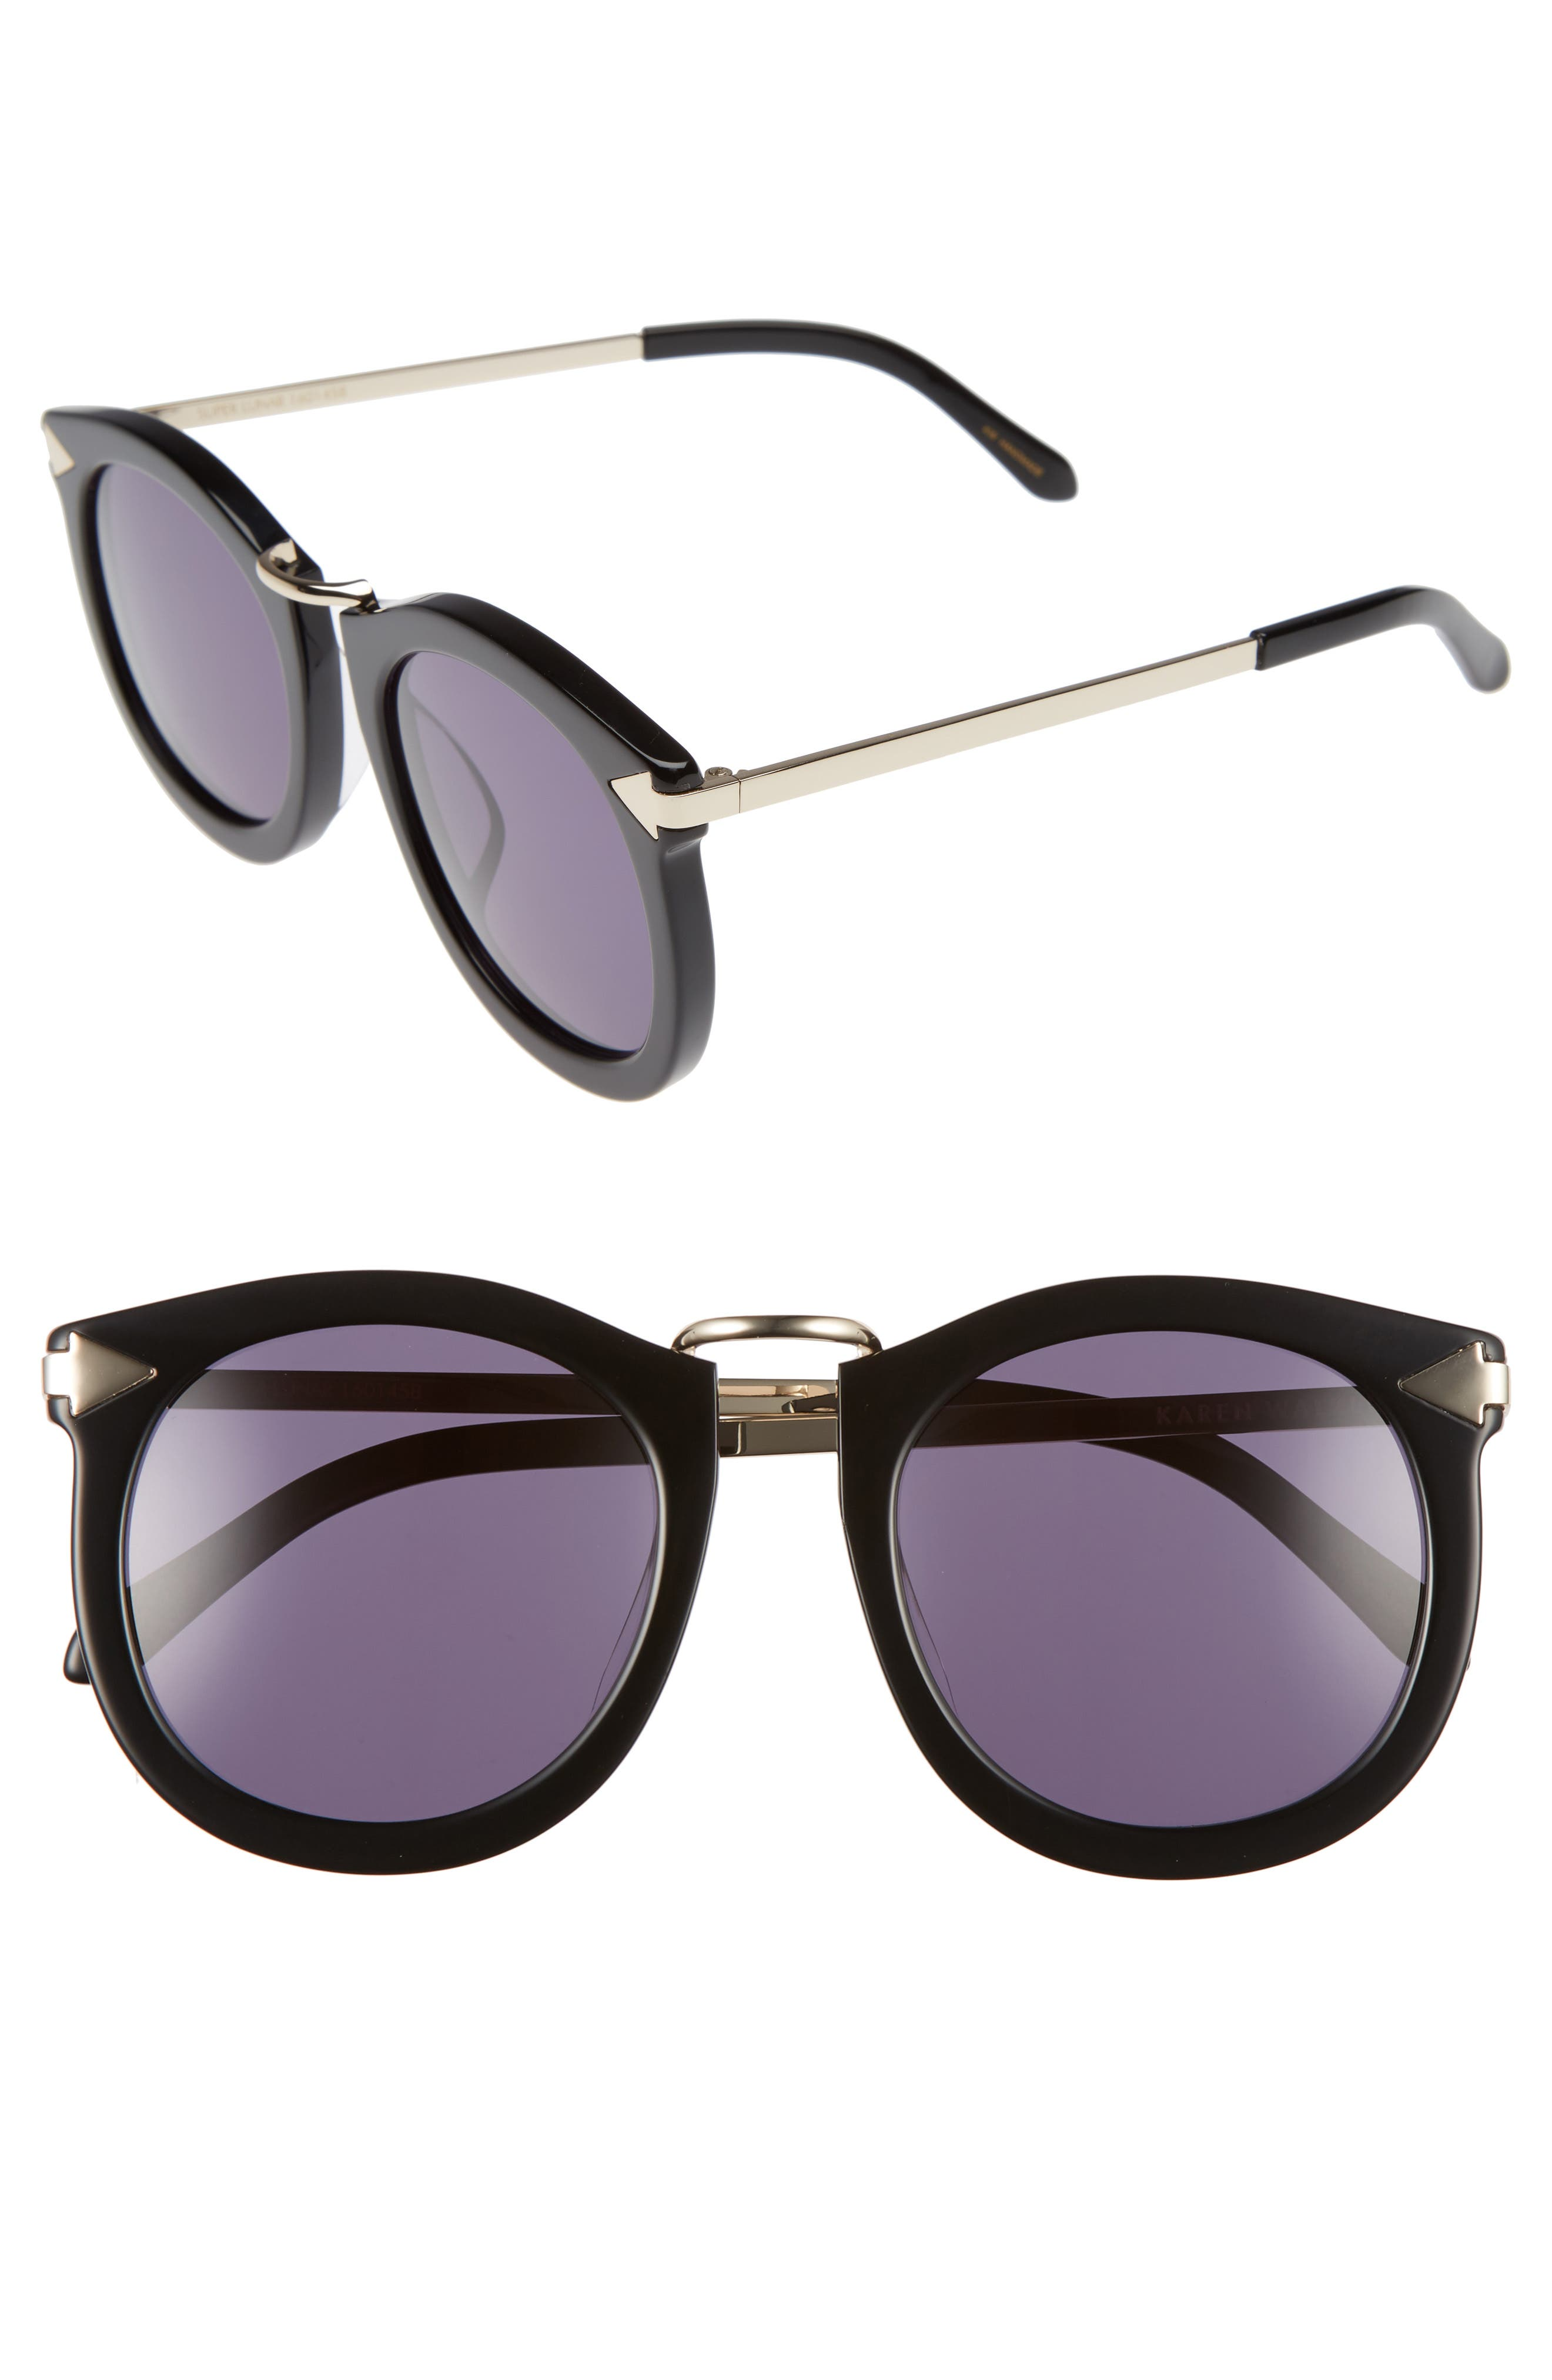 Alternative Fit Super Lunar - Arrowed by Karen 50mm Sunglasses,                             Alternate thumbnail 3, color,